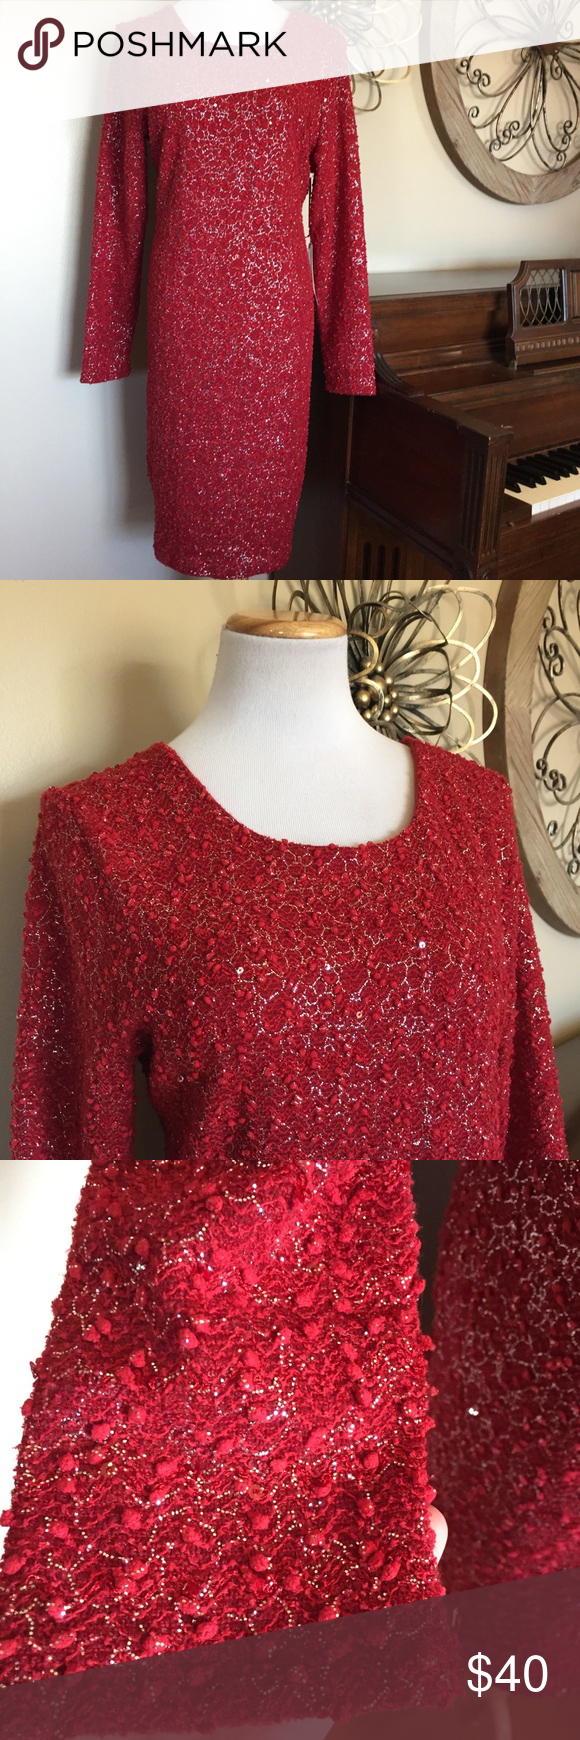 Nwt jlo size xxl red long sleeve dress nwt sleeved dress jennifer